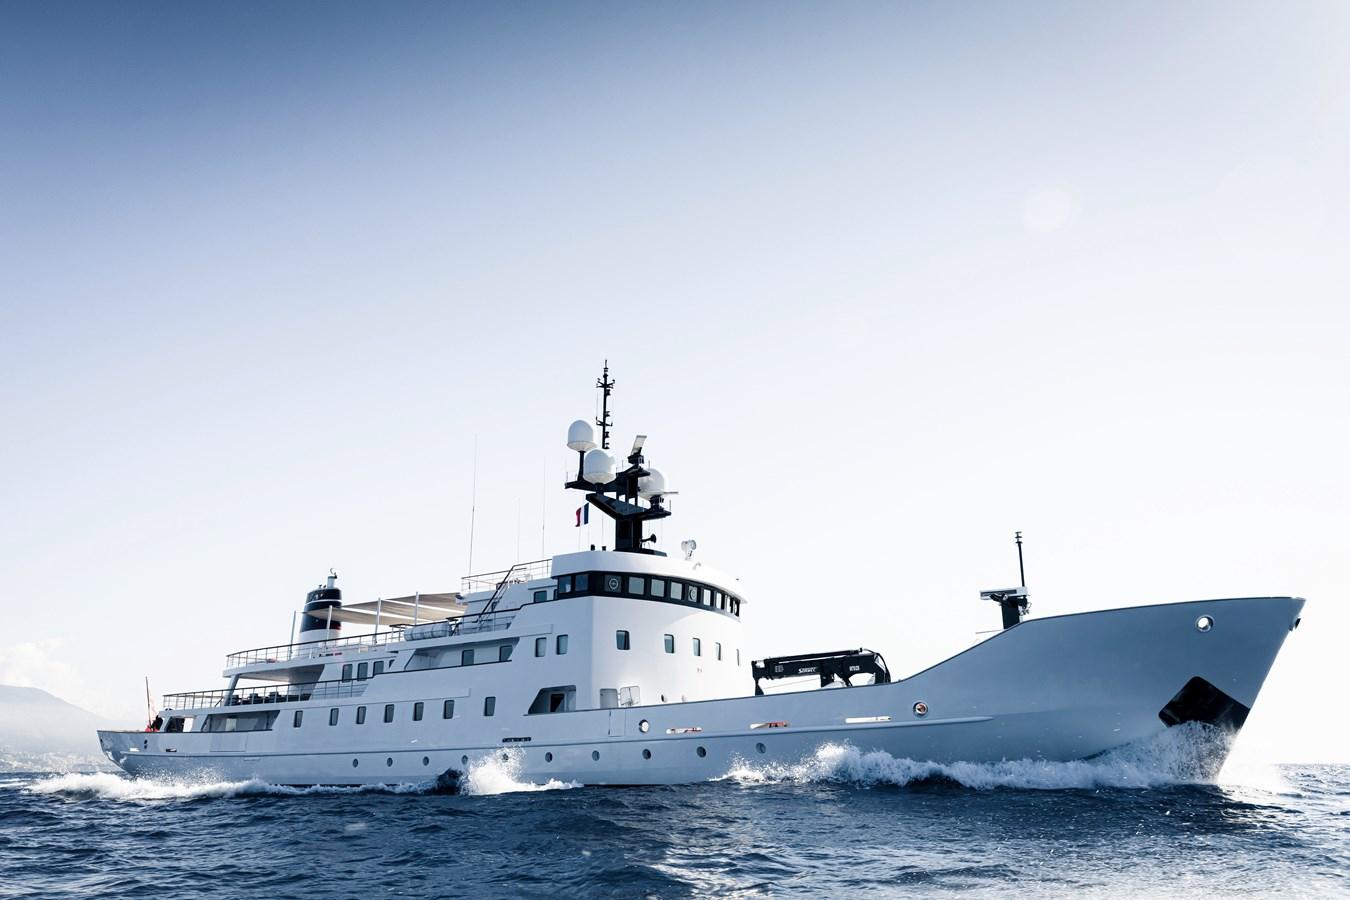 OLIVIA_00004897_vb1514779 1972 OY LAIVATEOLLISUUS  Mega Yacht 2726243